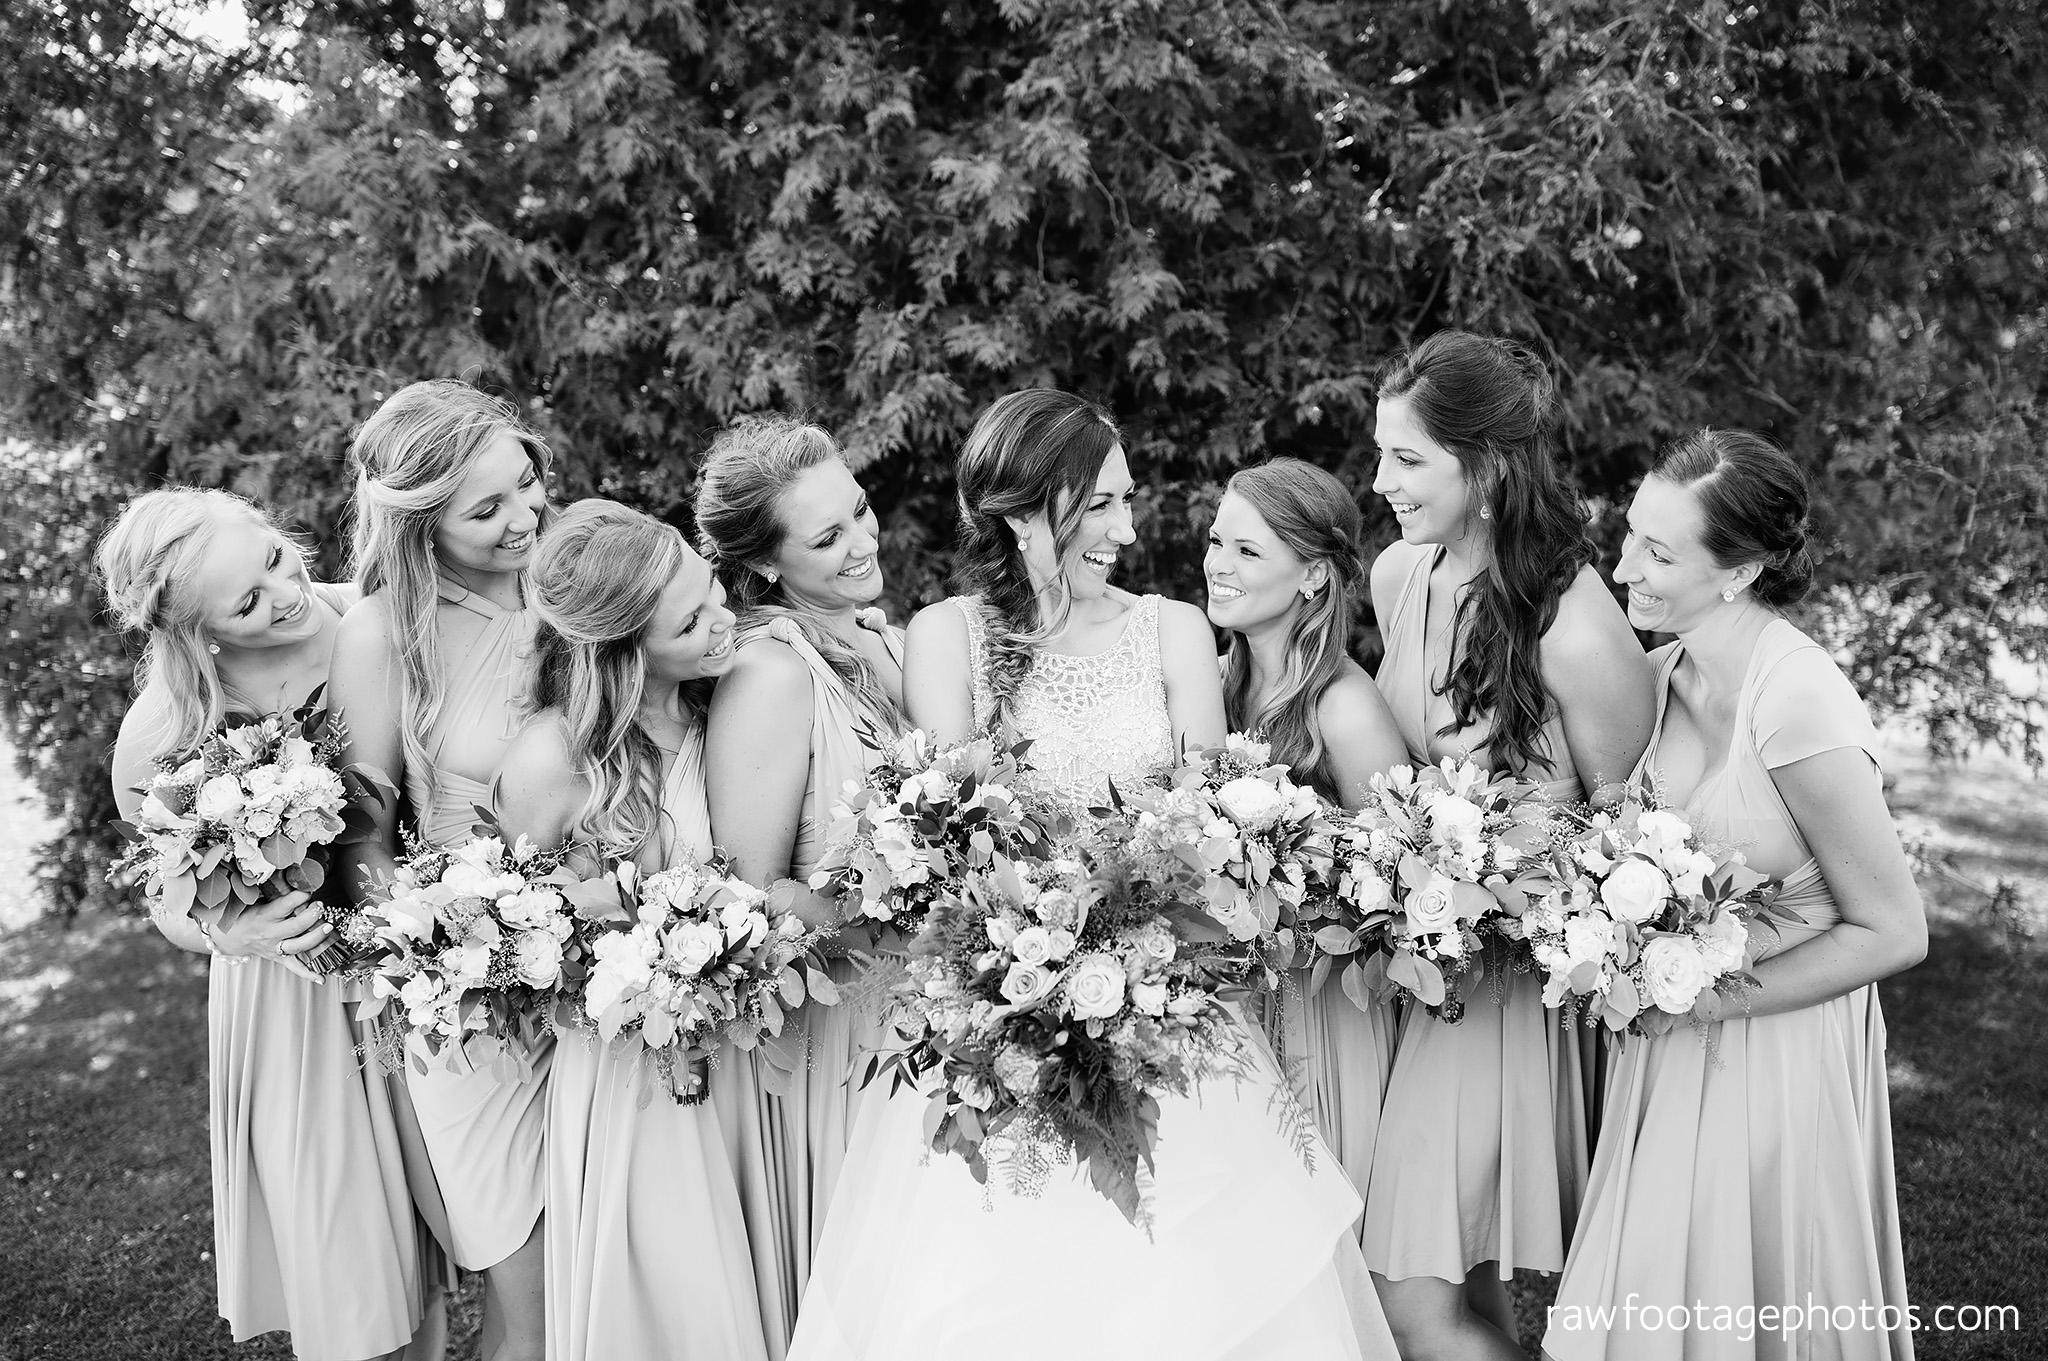 london_ontario_wedding_photographer-grand_bend_wedding_photographer-oakwood_resort_wedding-beach_wedding-sunset_wedding-raw_footage_photography037.jpg